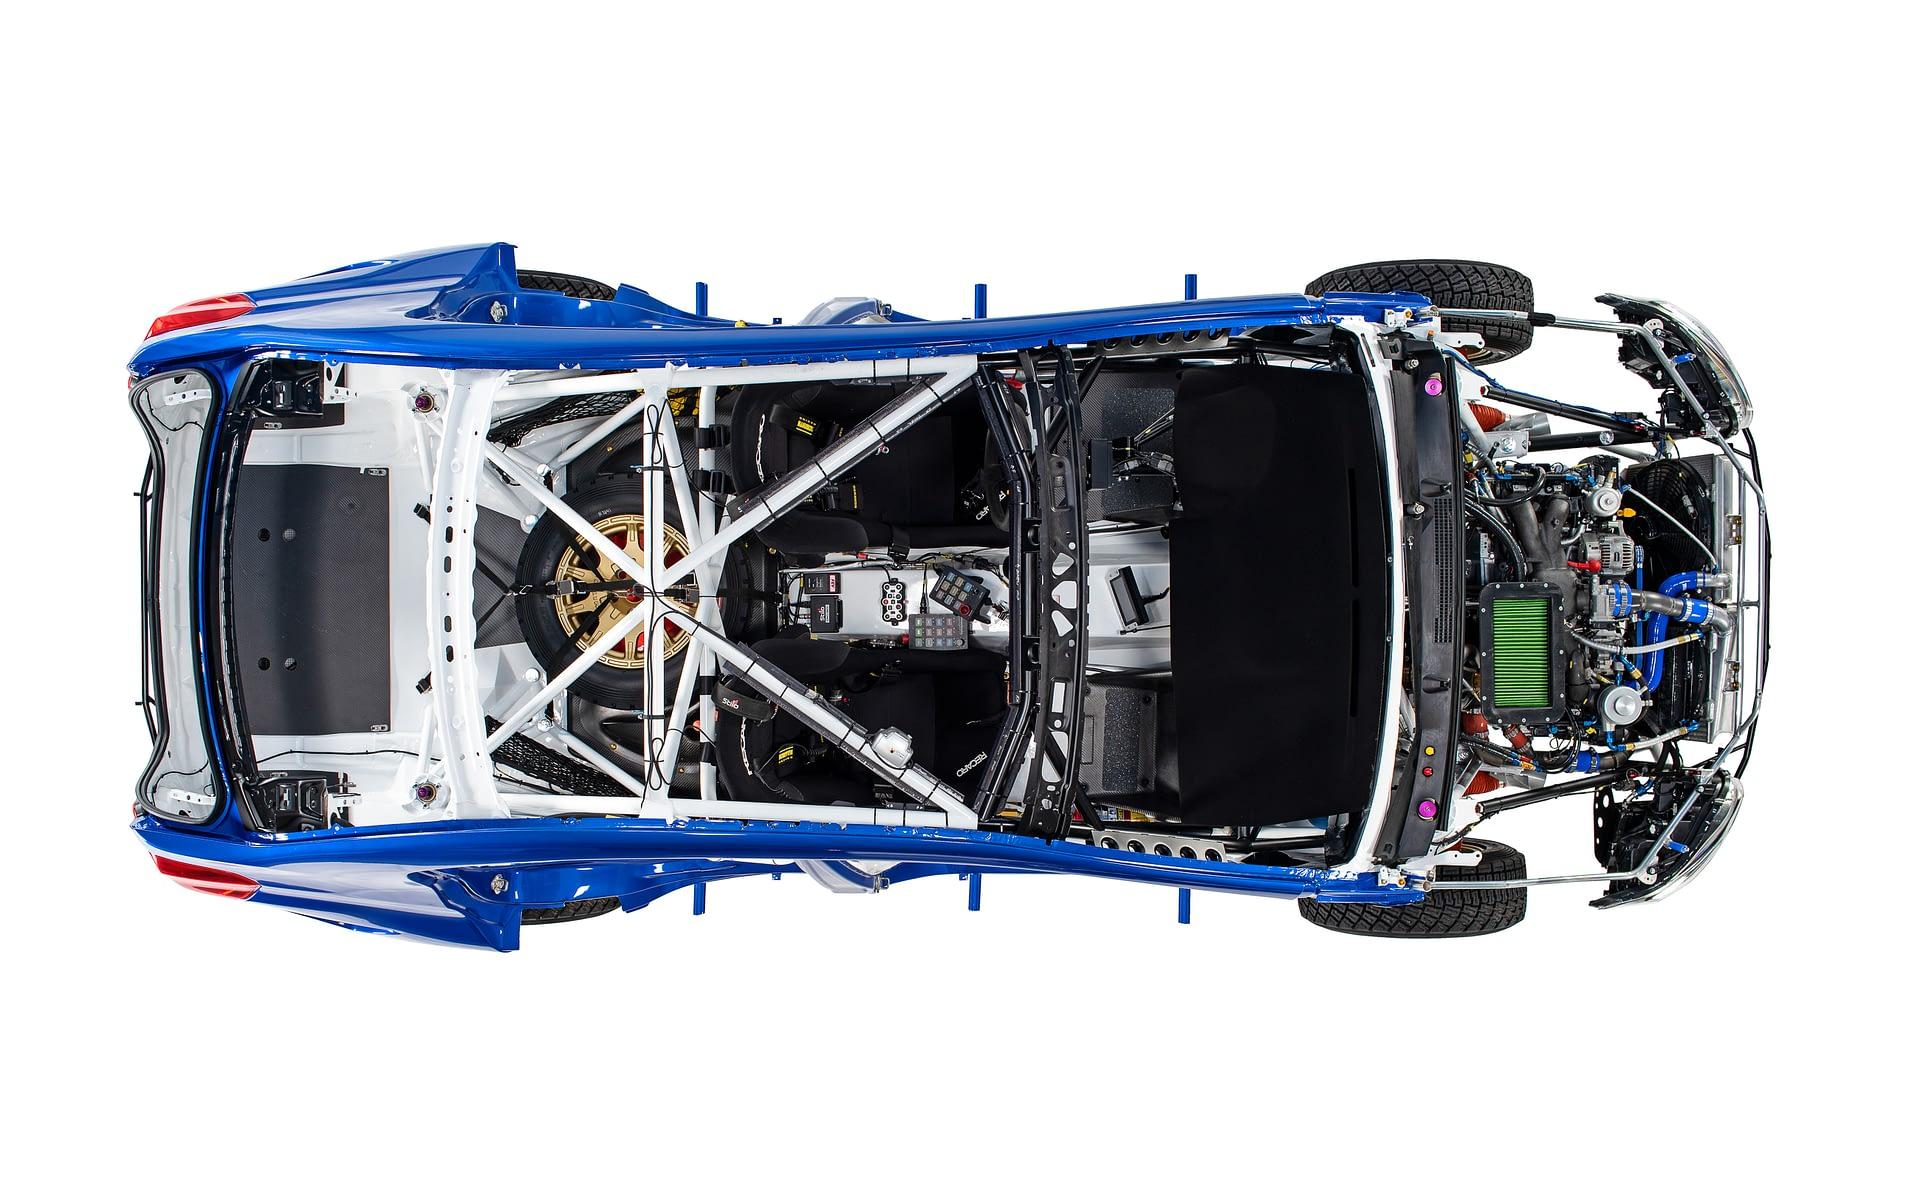 2019 Subaru Rally Technical Overhead 1